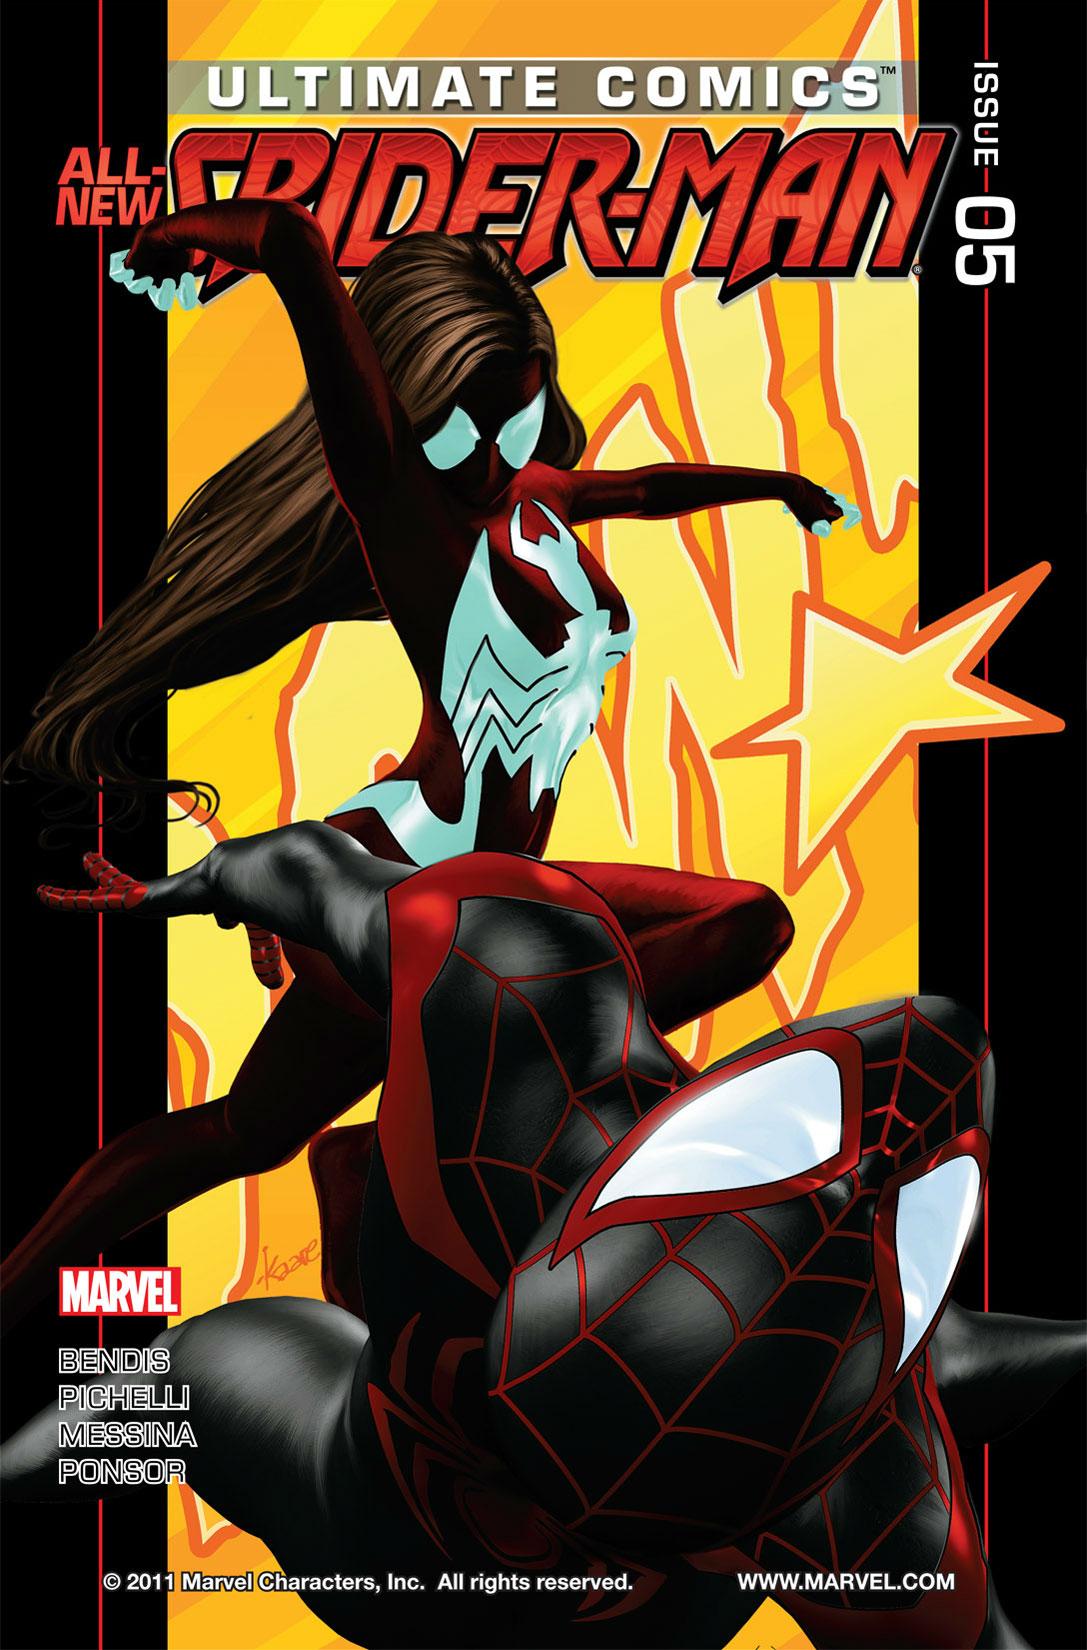 Ultimate comics spider man vol 1 5 marvel comics database - Marvel spiderman comics pdf ...